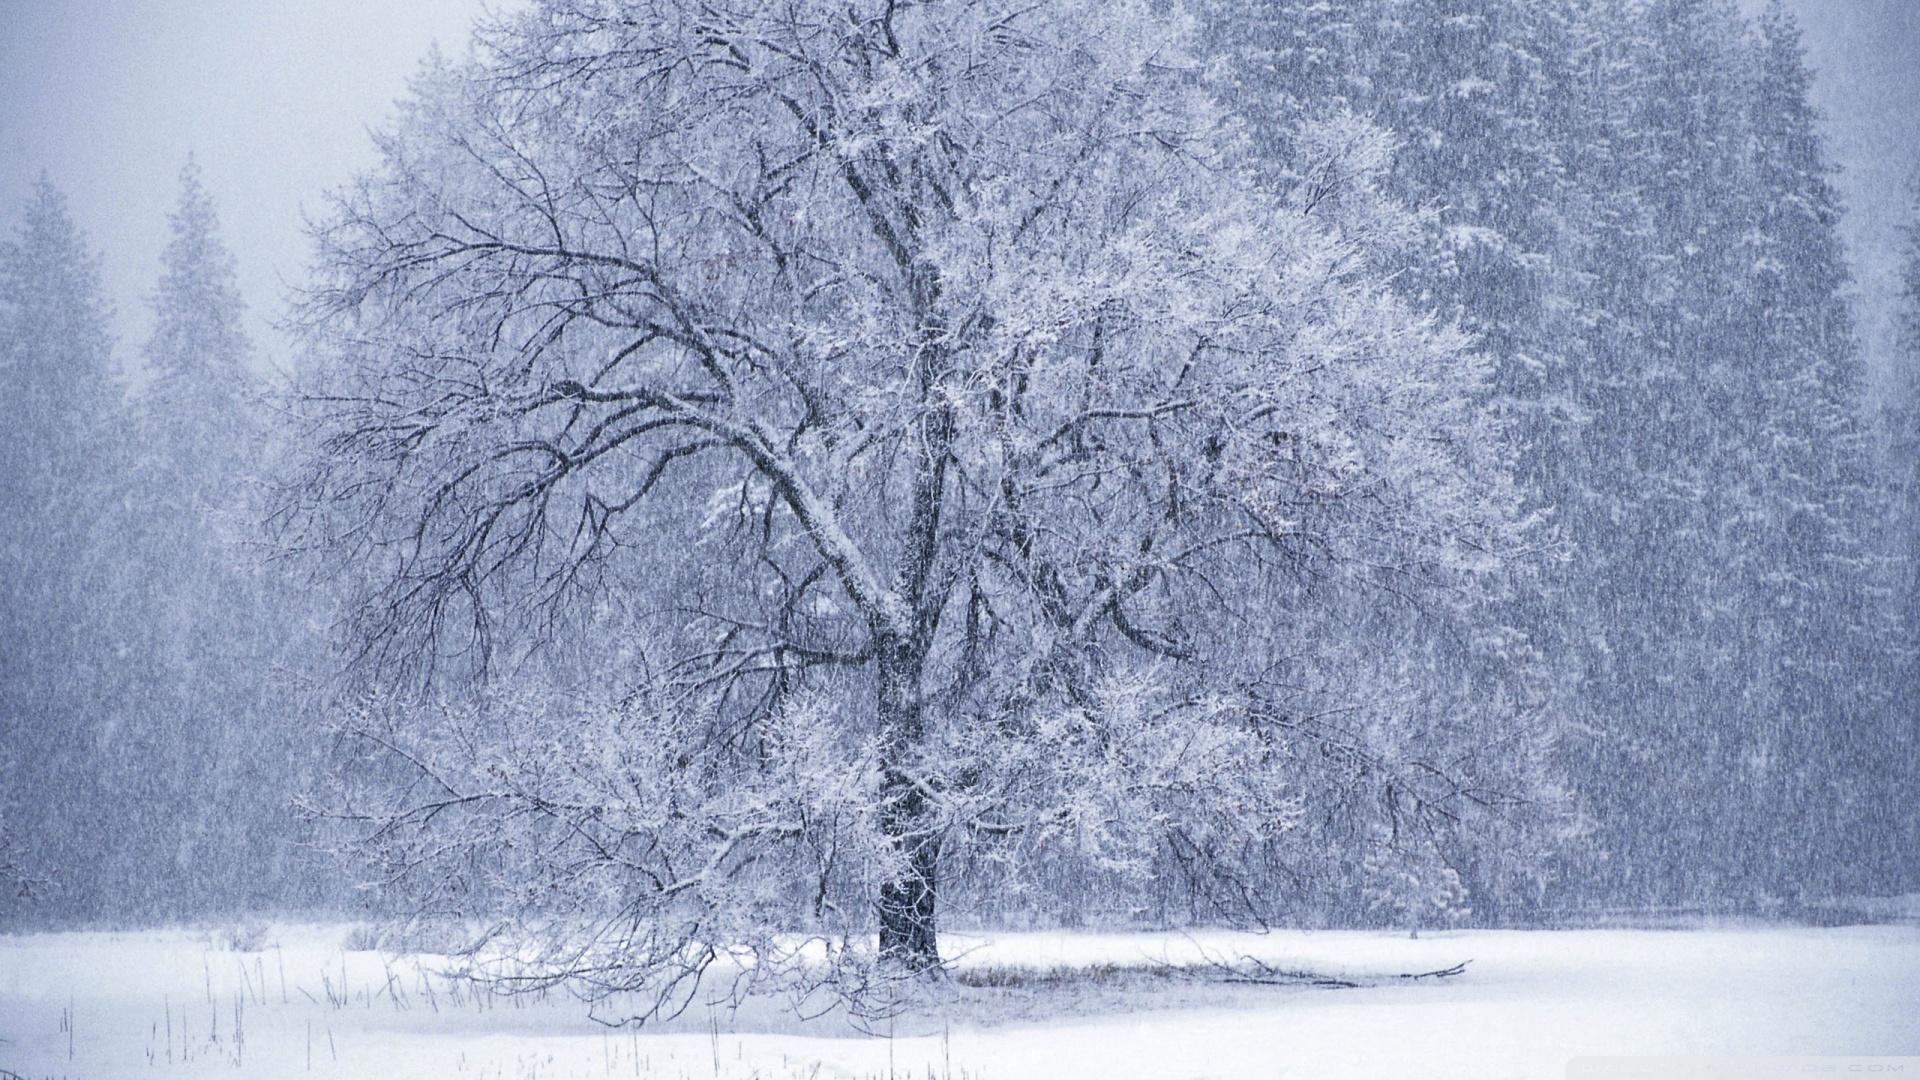 Snow Falling Wallpaper 1920x1080 Snow Falling 1920x1080